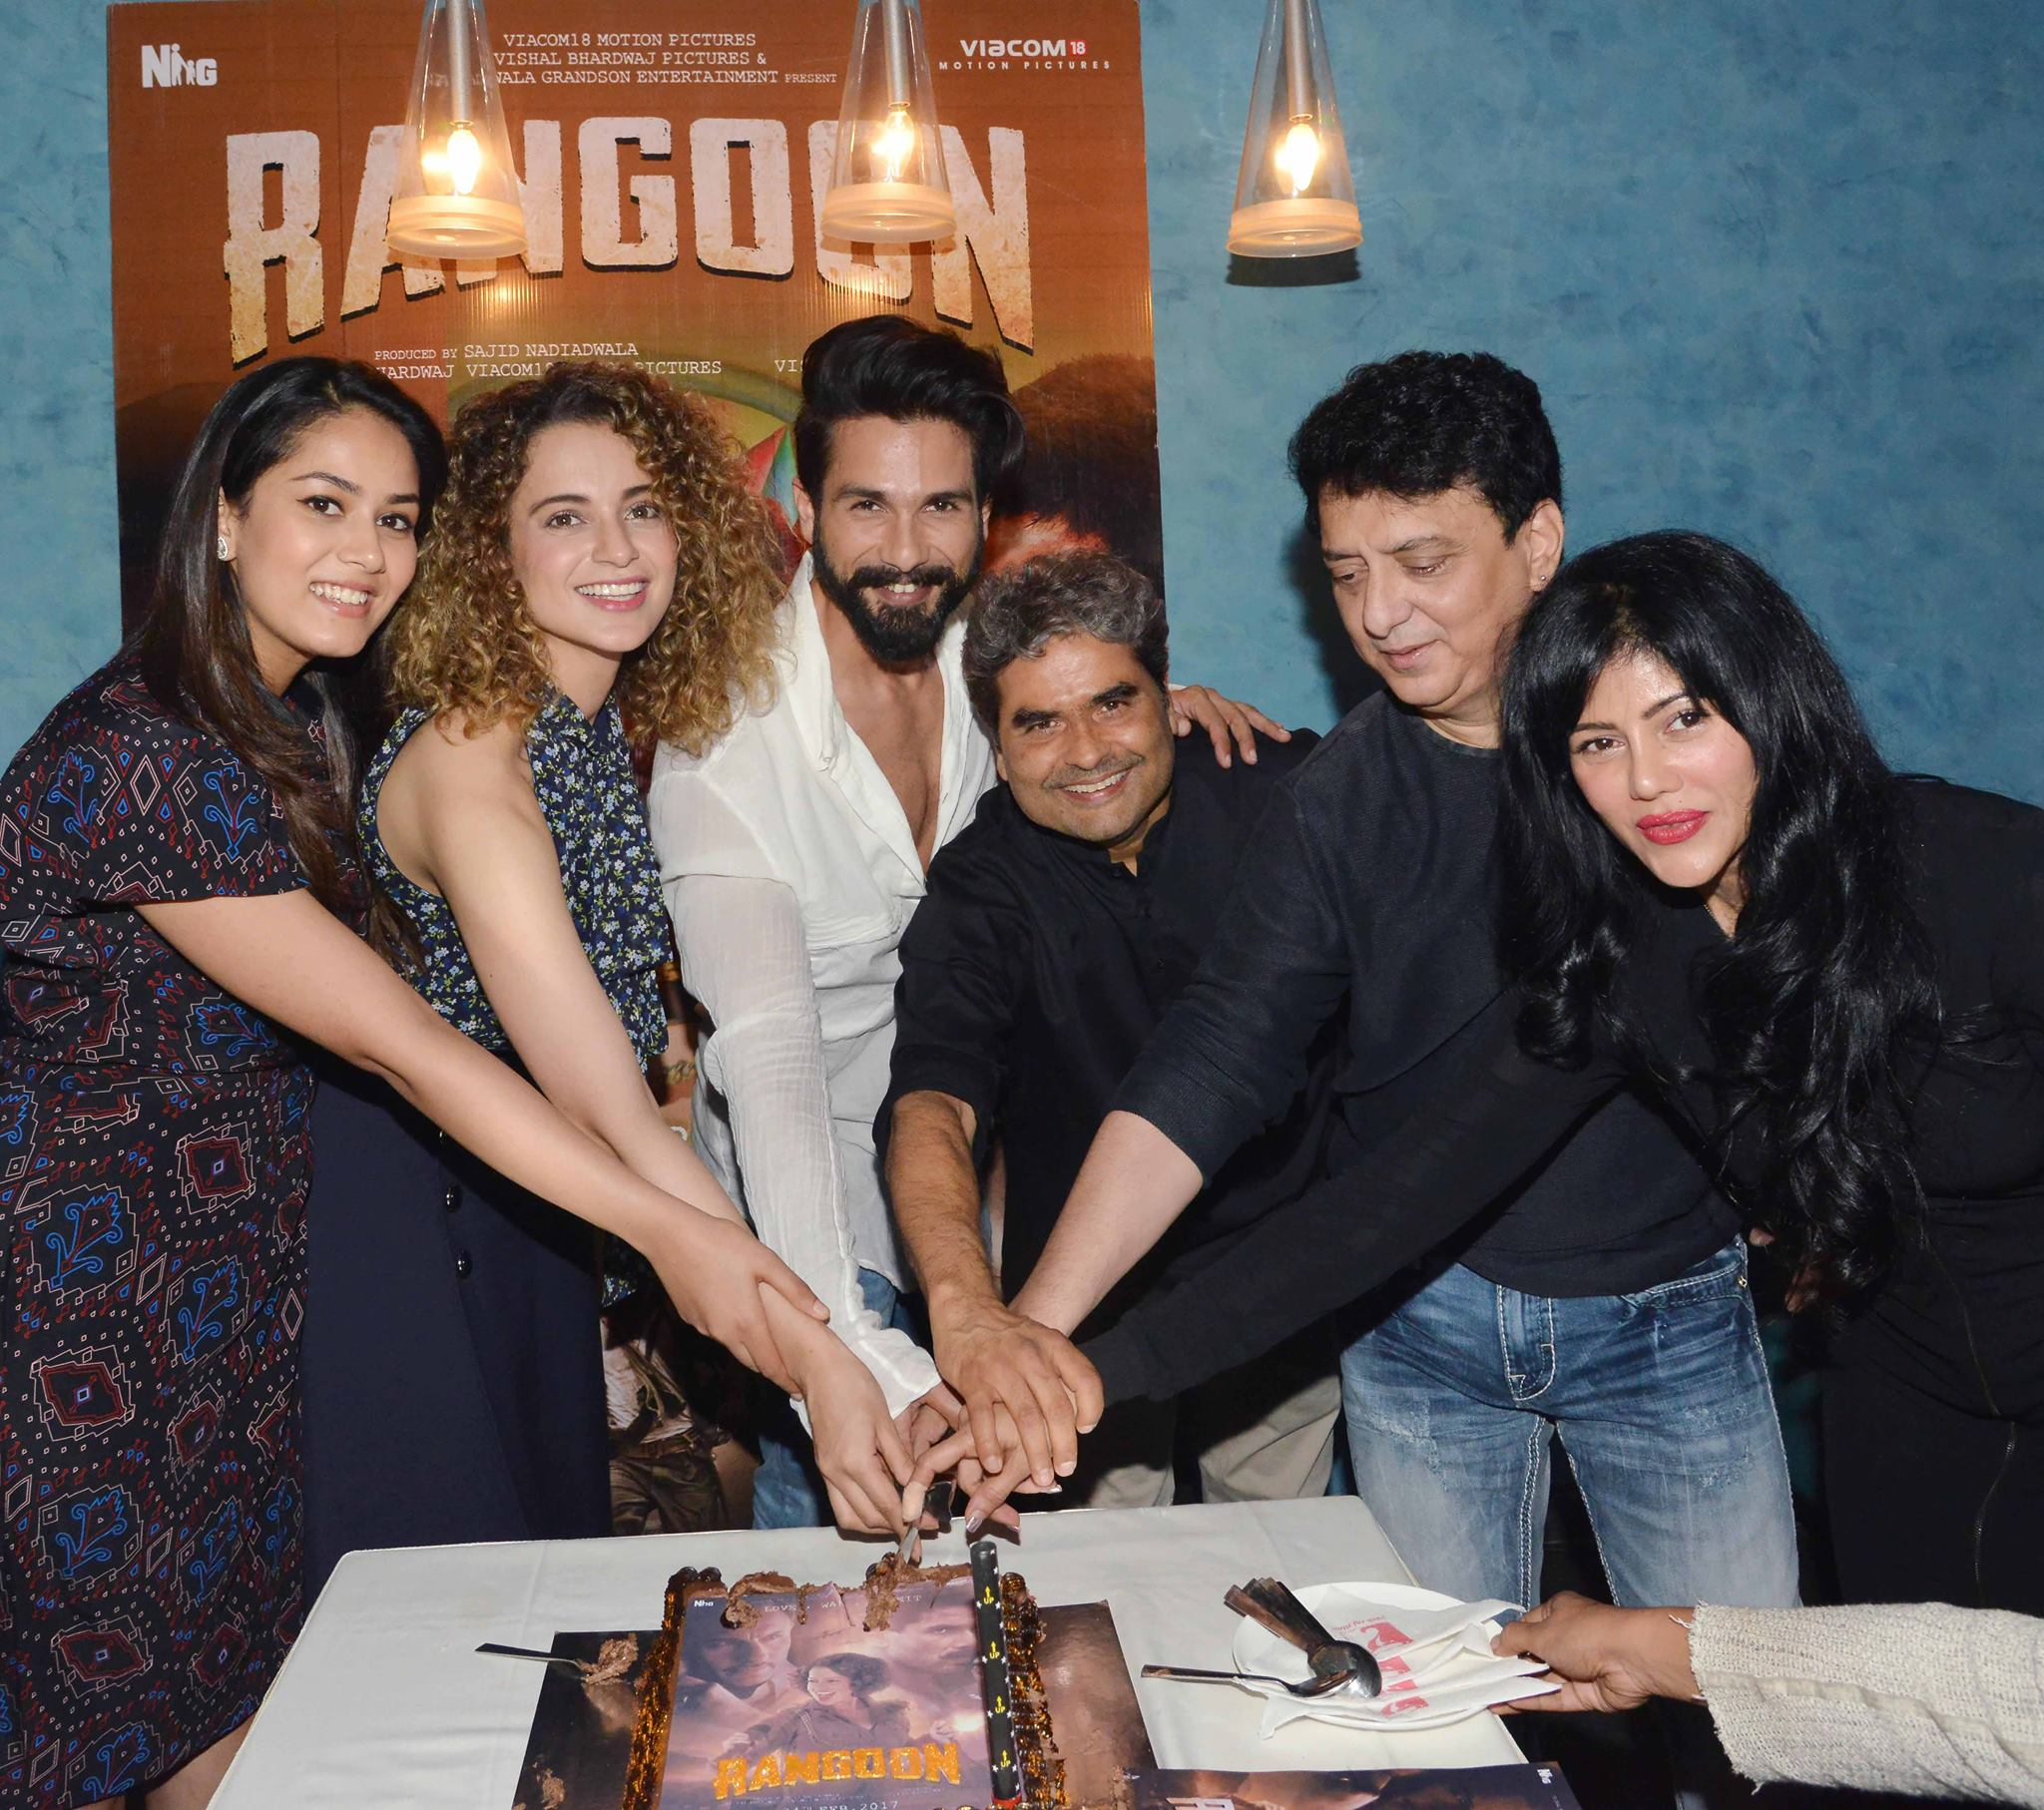 Screening of Rangoon movie stars Kangana Ranaut and Shahid Kapoor produced by Sajid Nadiadwala